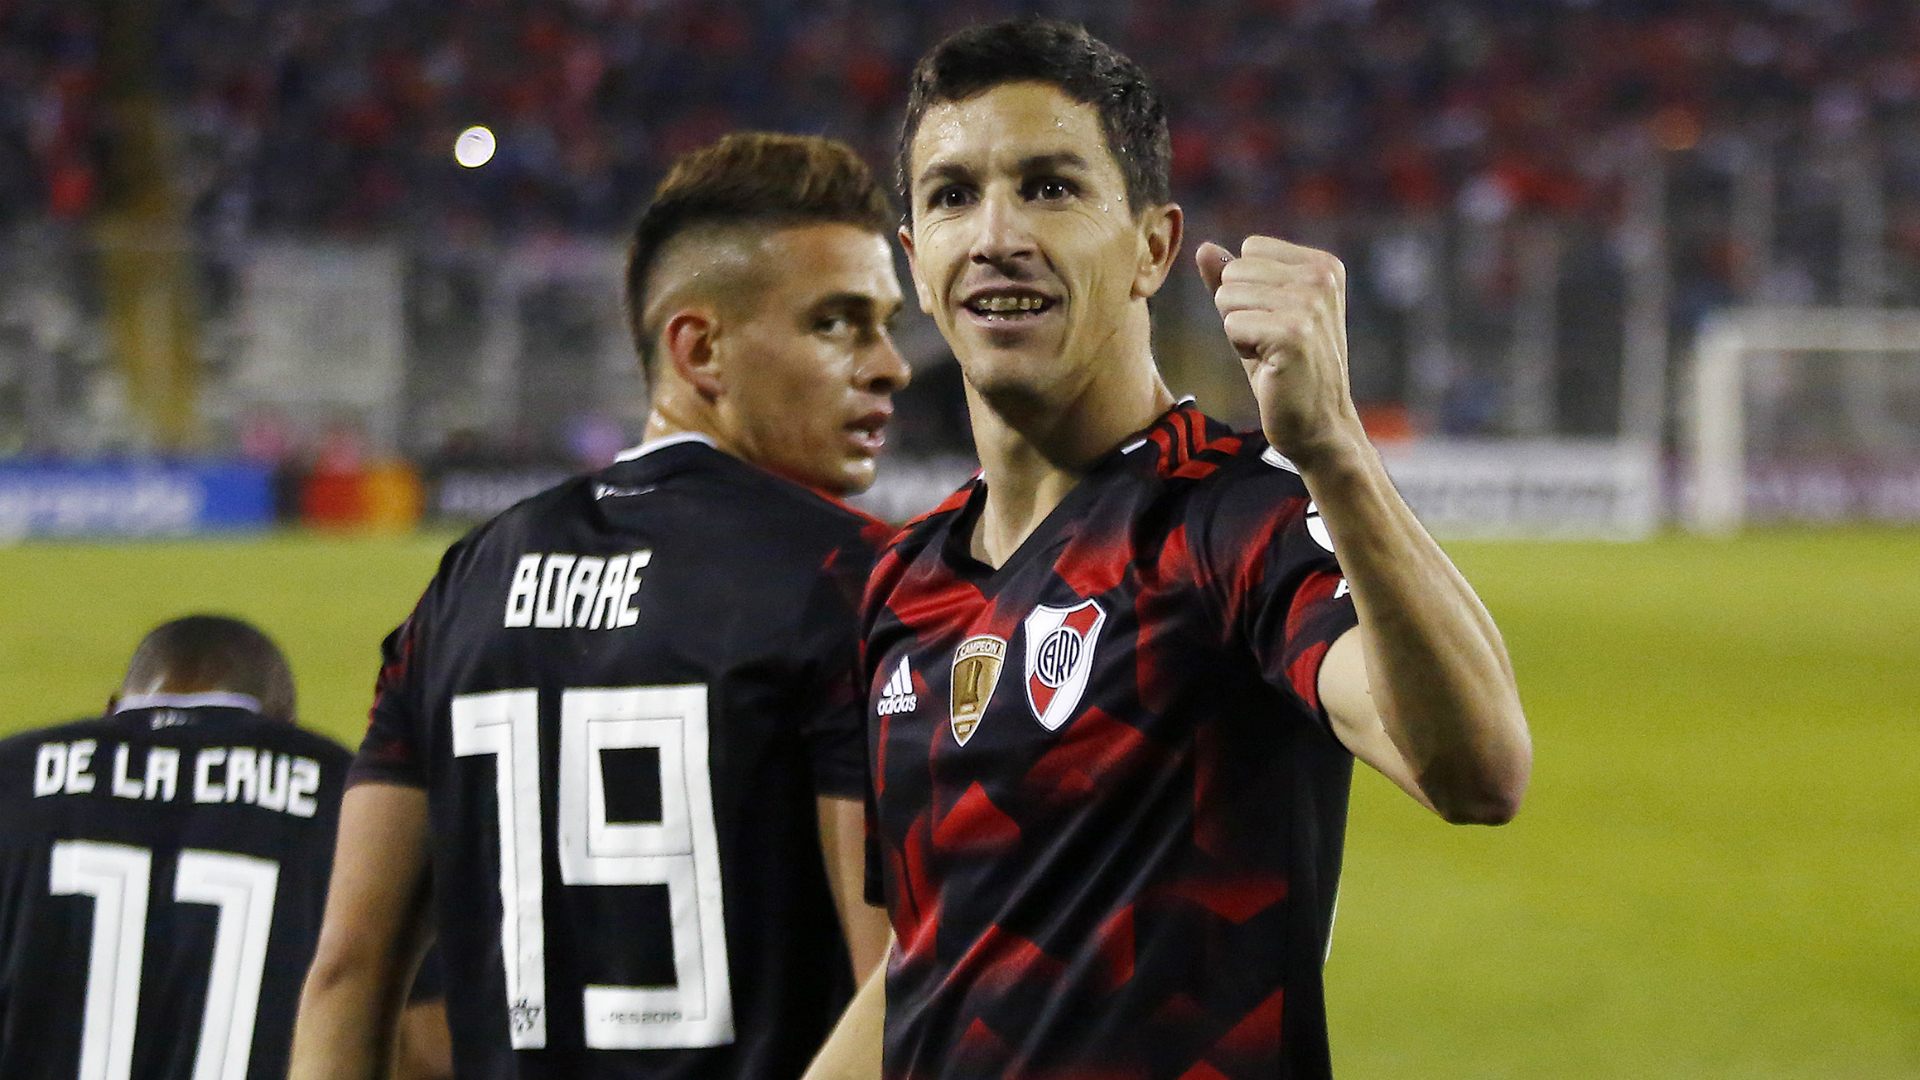 River's Libertadores defence continues against Cruzeiro